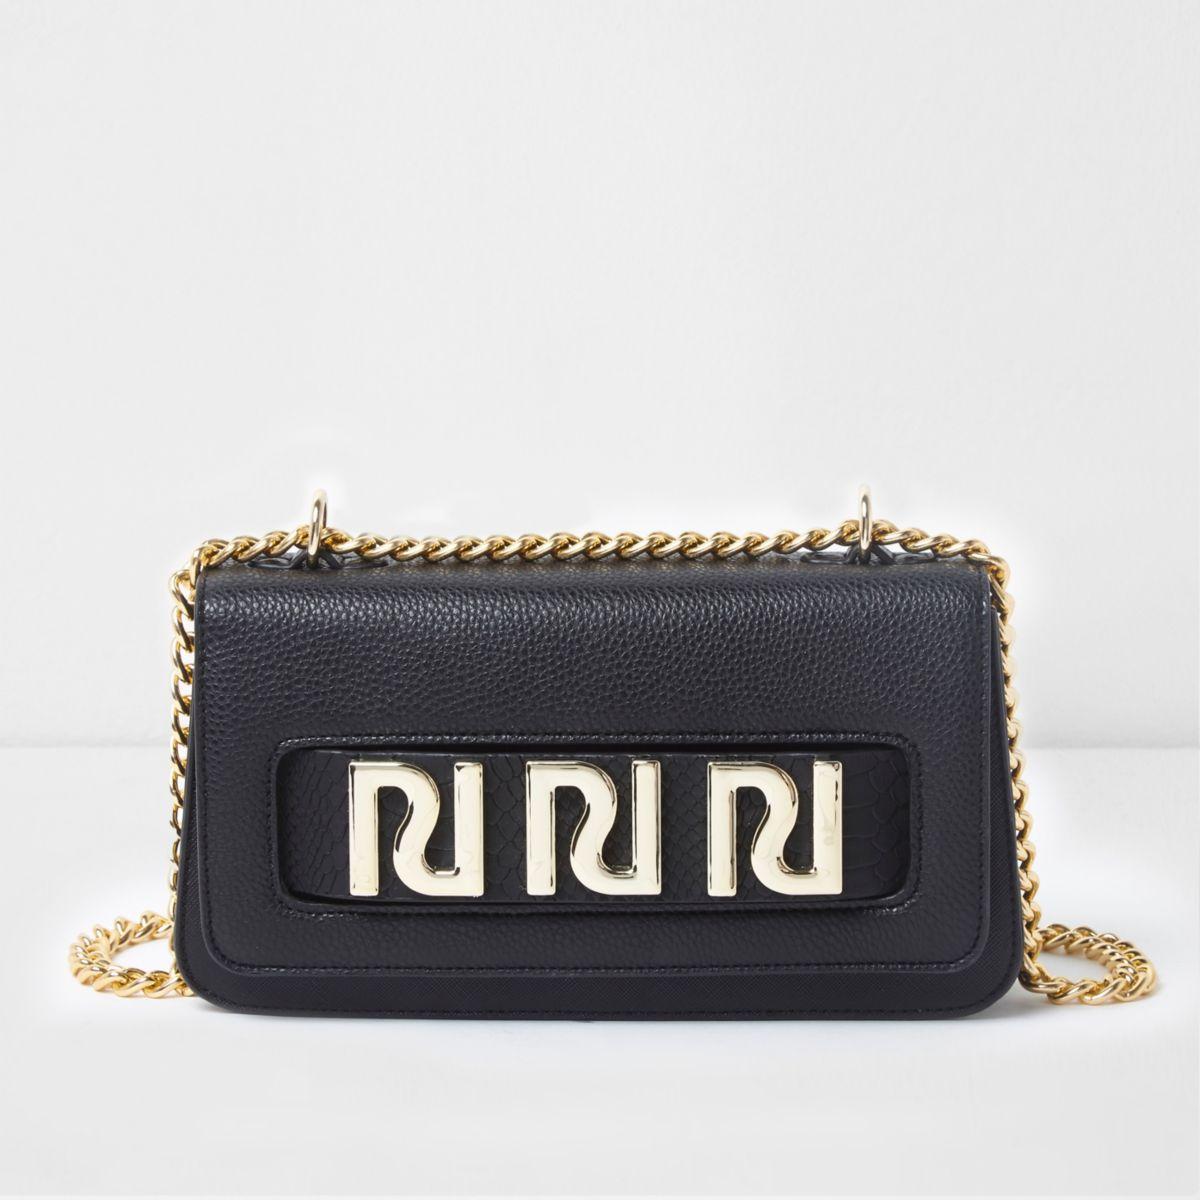 Zwarte onderarmtas met ketting en RI-logo